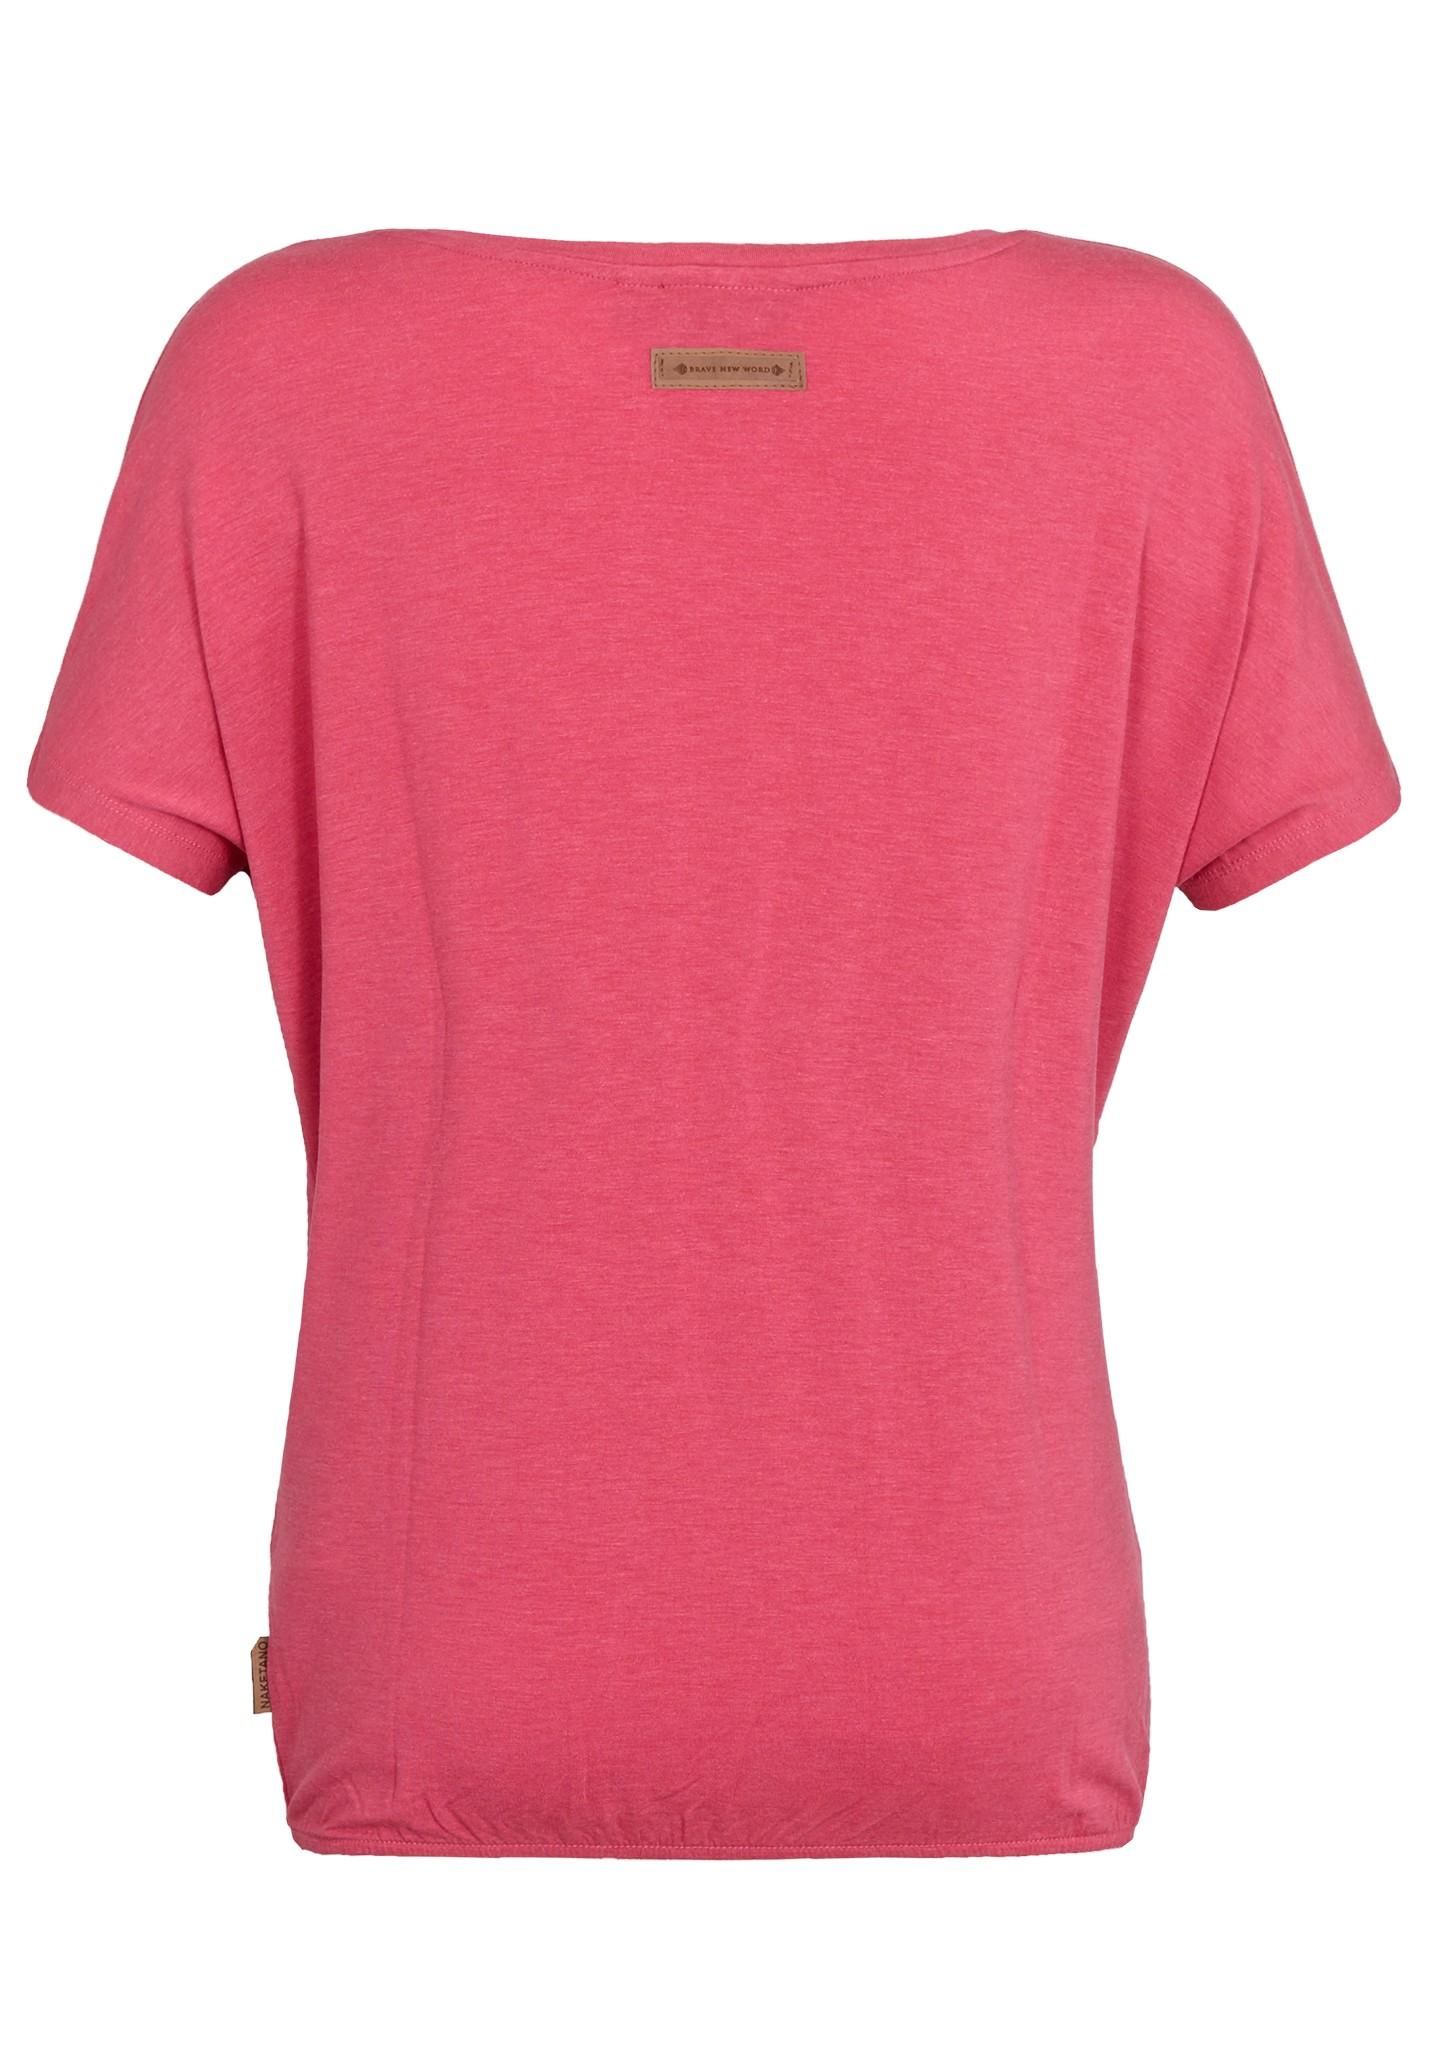 neu naketano die gedudelte damen t shirt shirt ebay. Black Bedroom Furniture Sets. Home Design Ideas